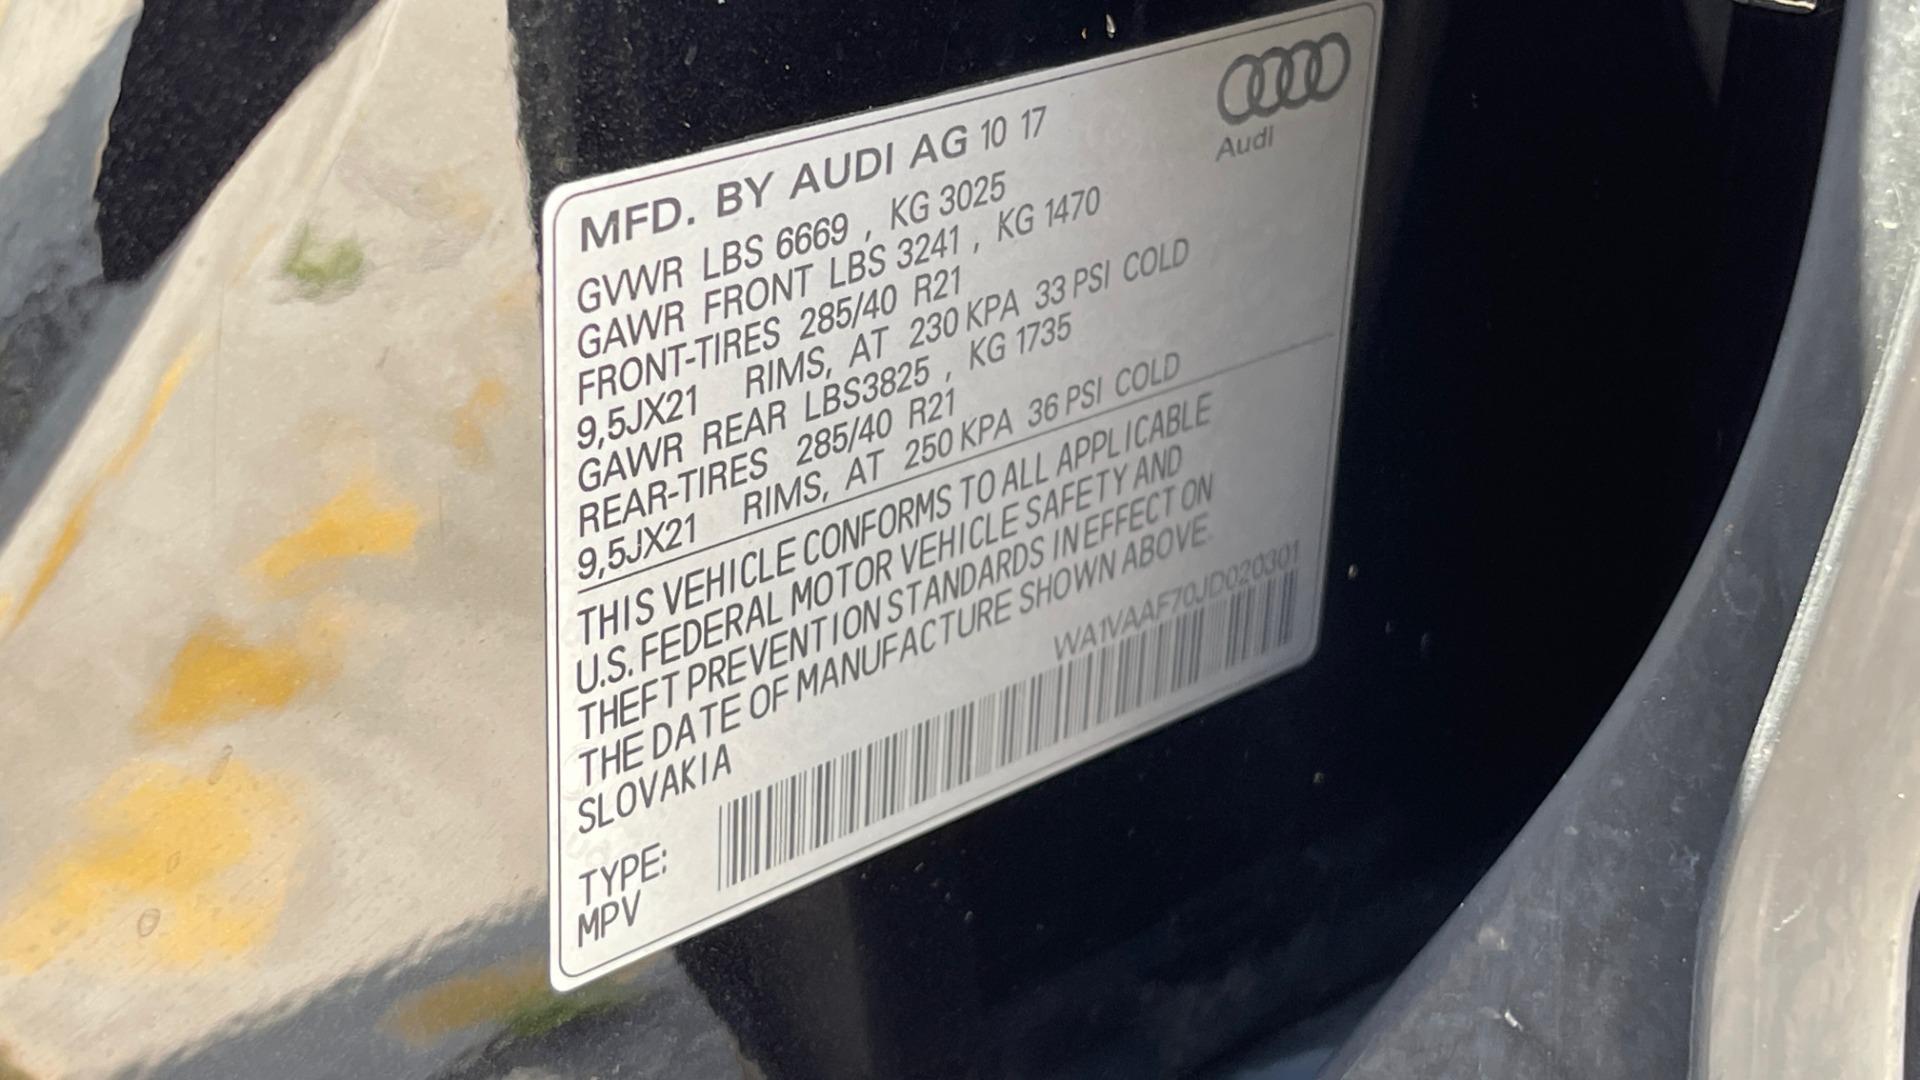 Used 2018 Audi Q7 PRESTIGE TIPTRONIC / NAV / SUNROOF / ADAPTIVE PKG / DRVR ASST / CLD WTHR /  for sale $49,995 at Formula Imports in Charlotte NC 28227 28